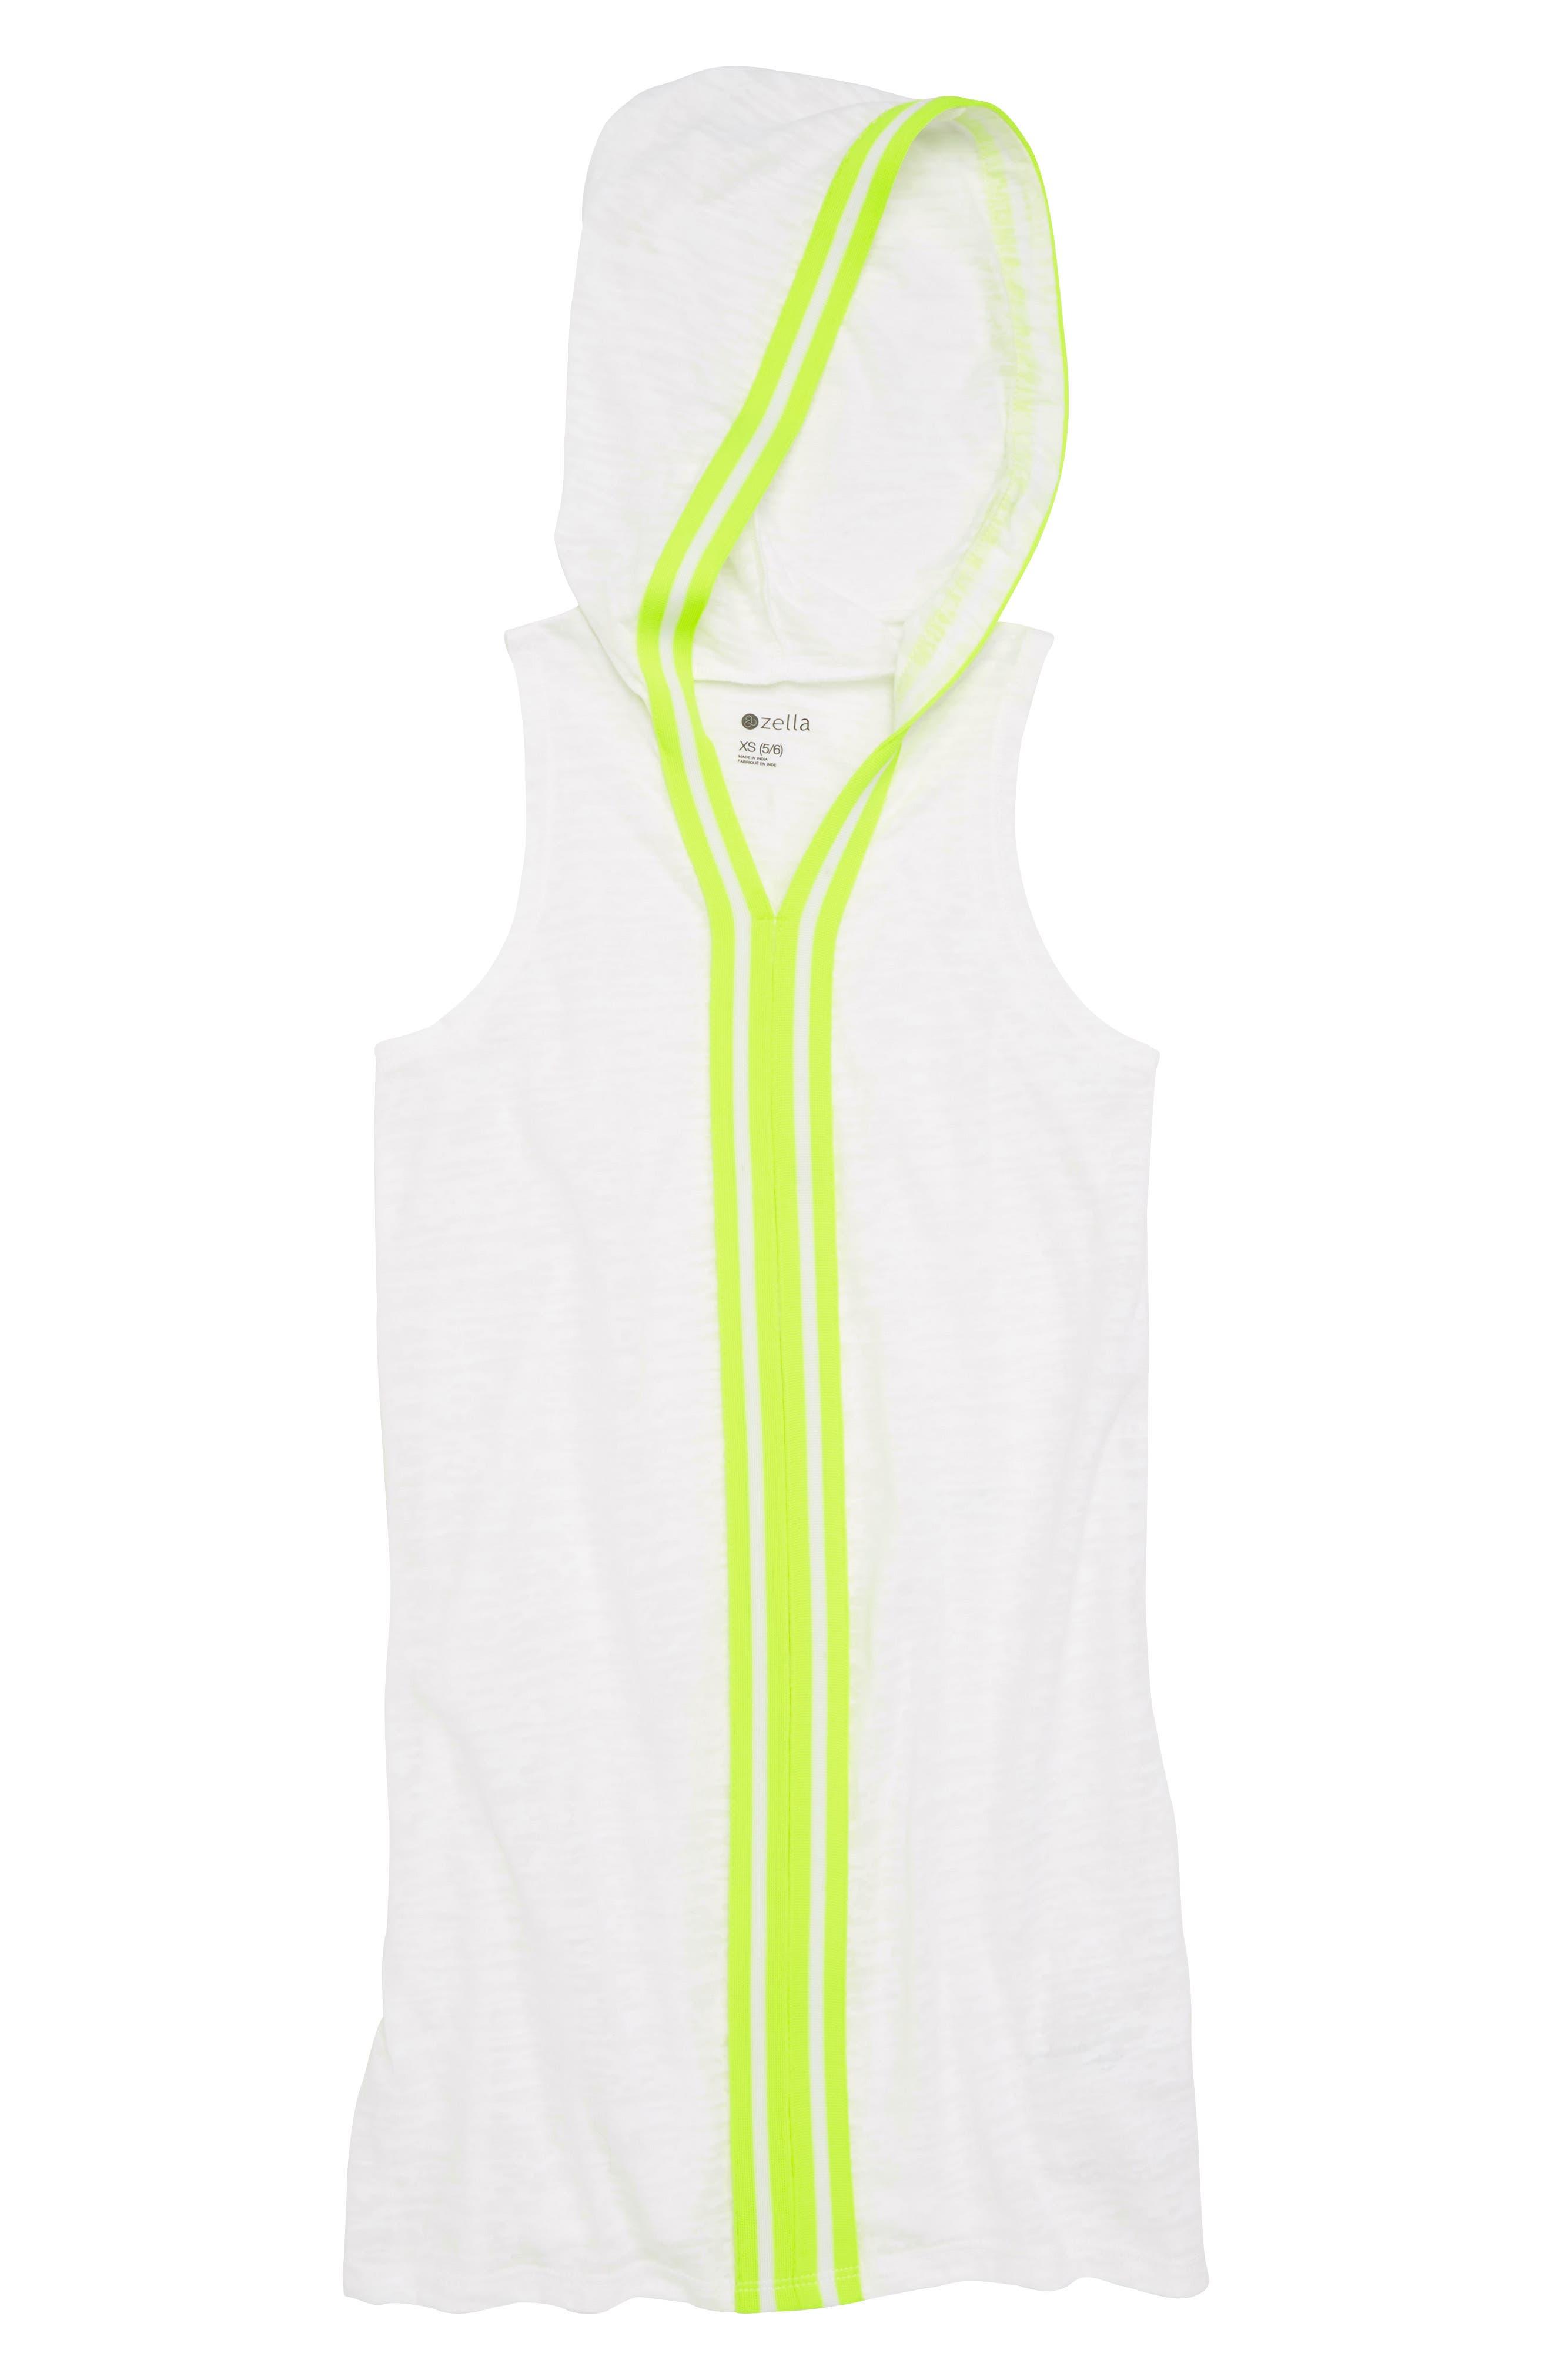 Zella Neon Hooded Cover-Up Dress,                             Main thumbnail 1, color,